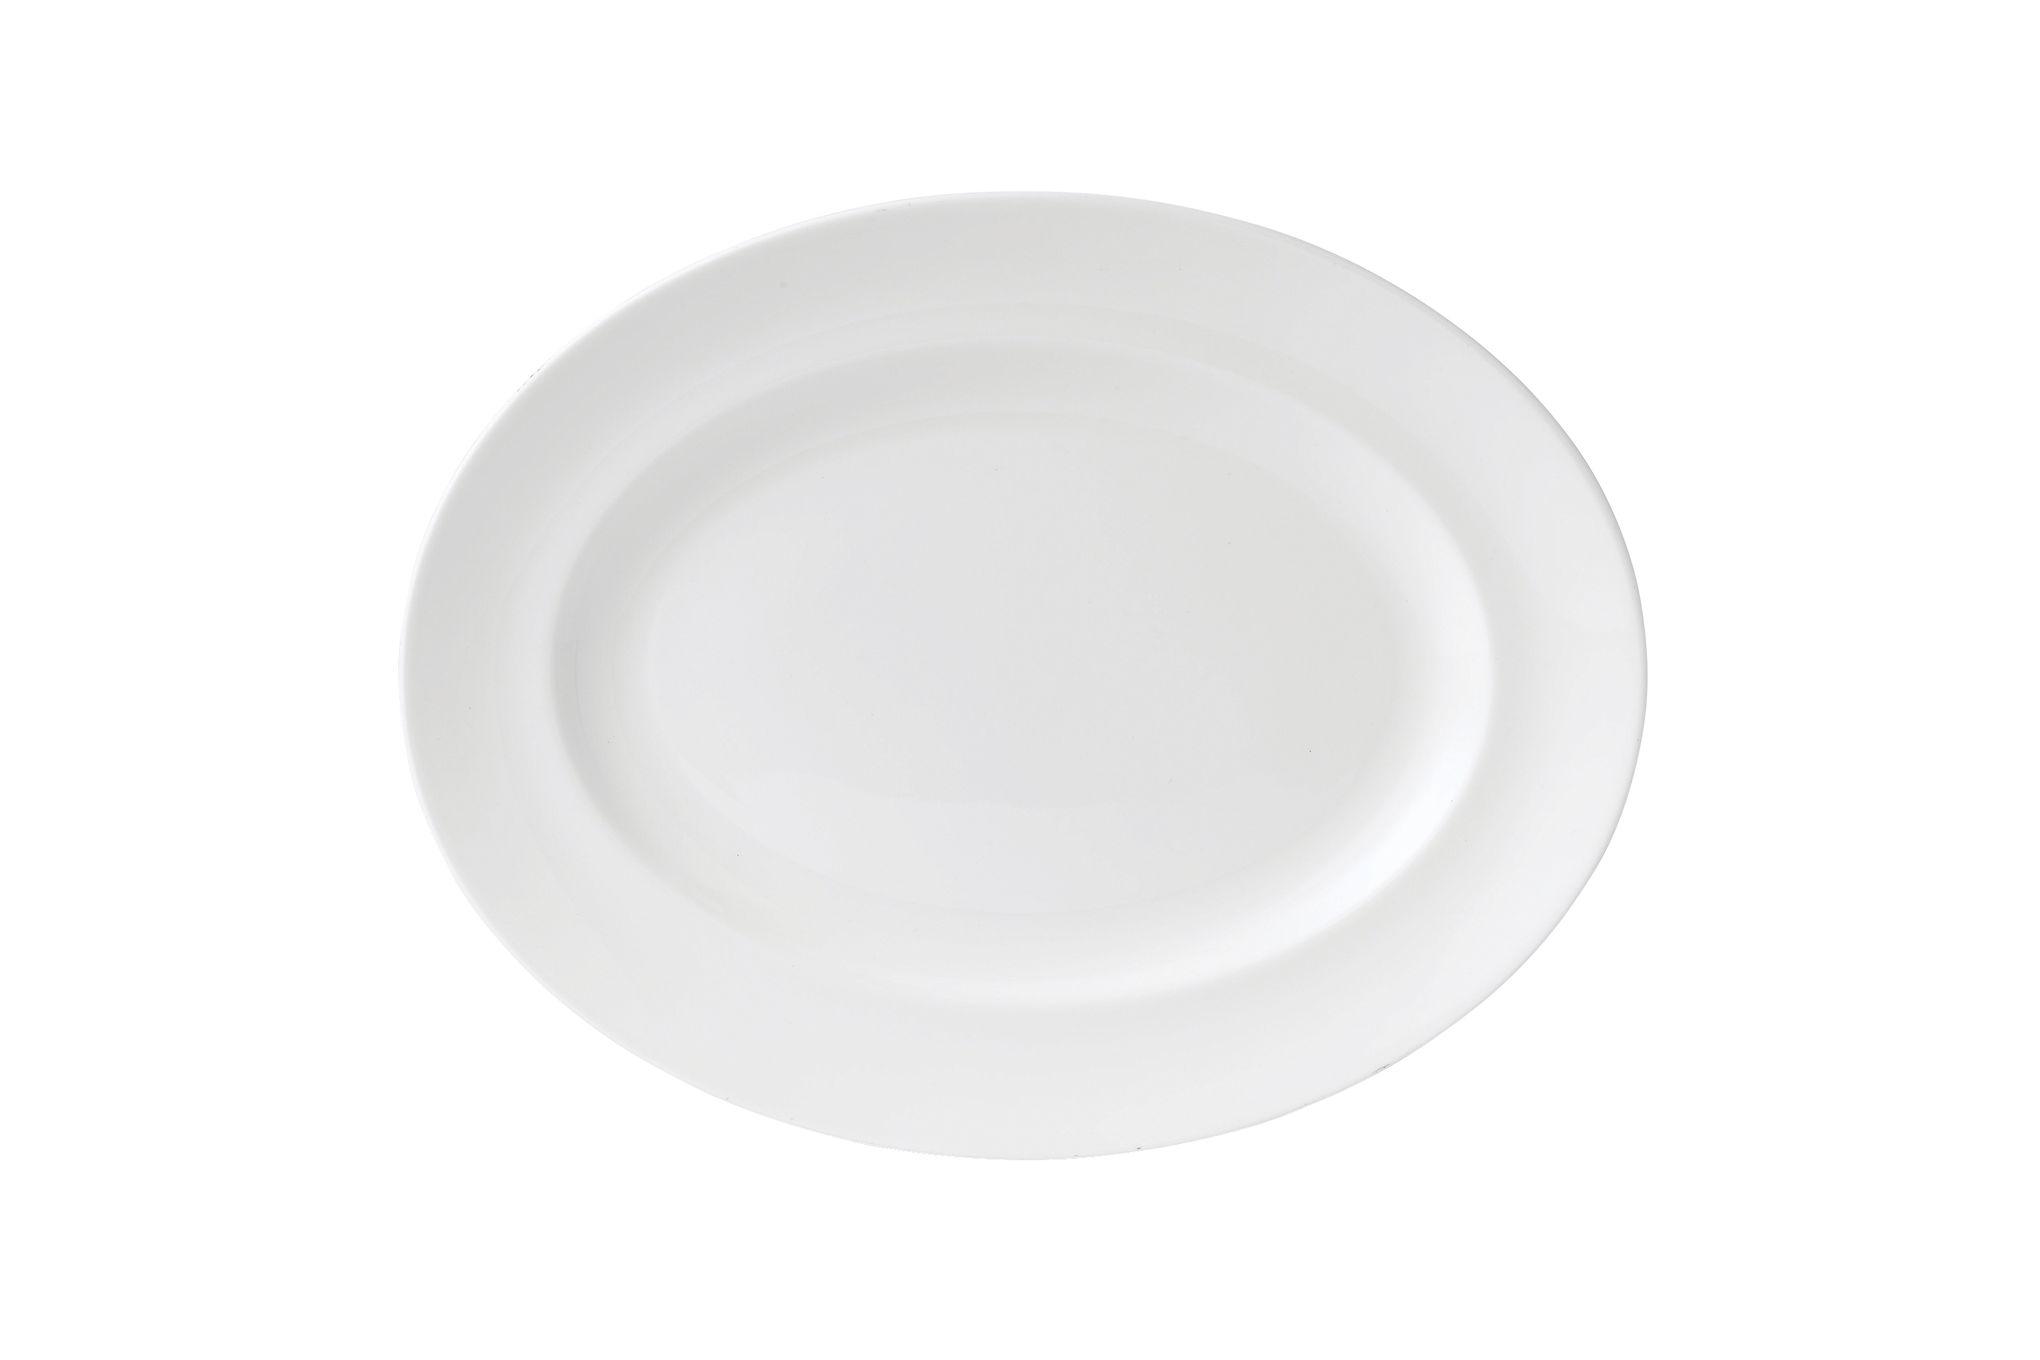 Wedgwood Wedgwood White Oval Plate / Platter 35cm thumb 1